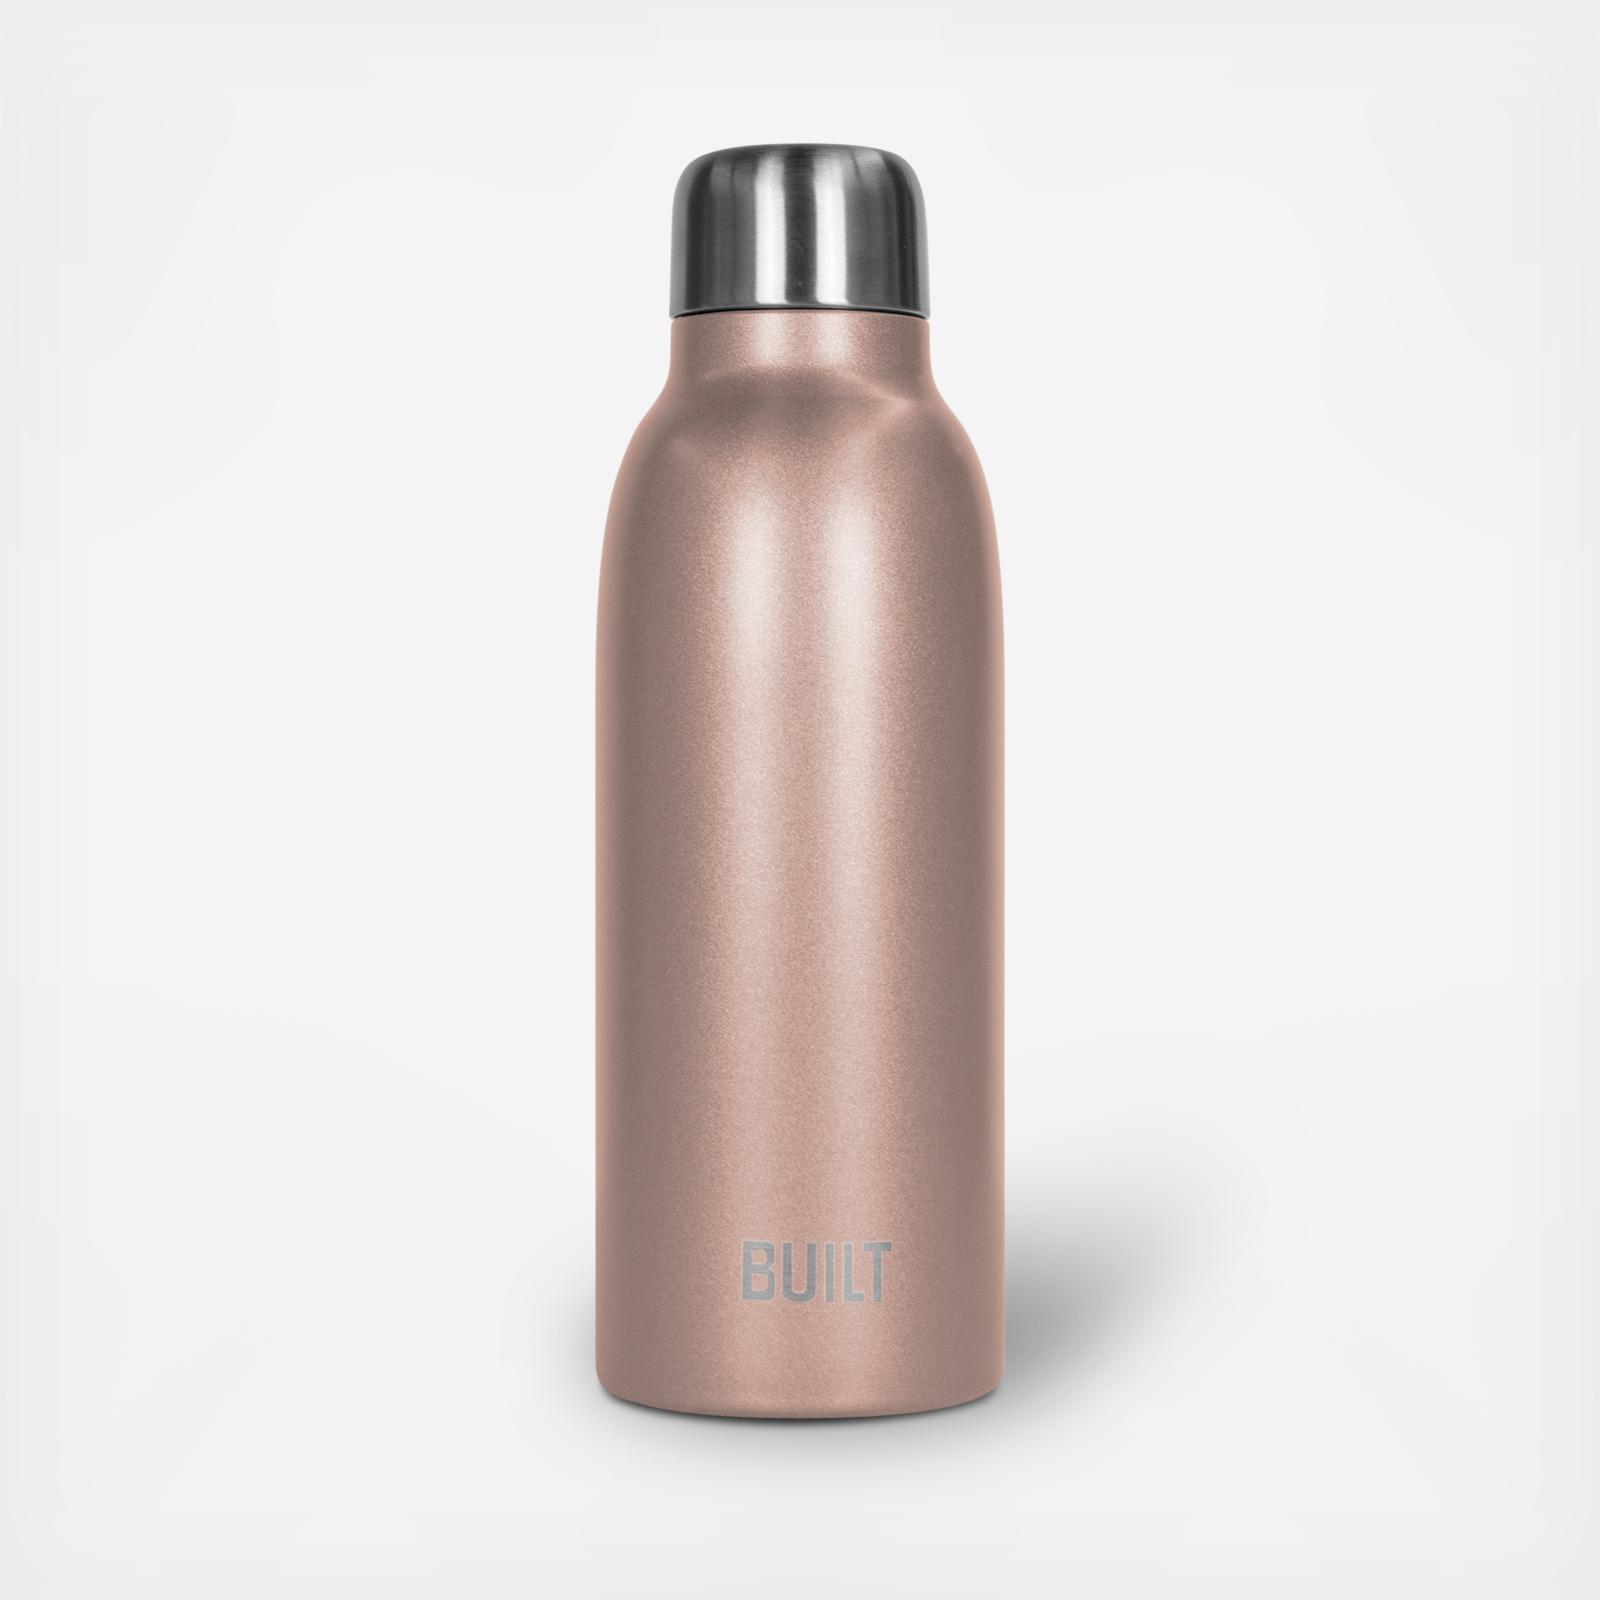 fcf607541d6 Built New York ›. Perfect Seal Caliber Bottle